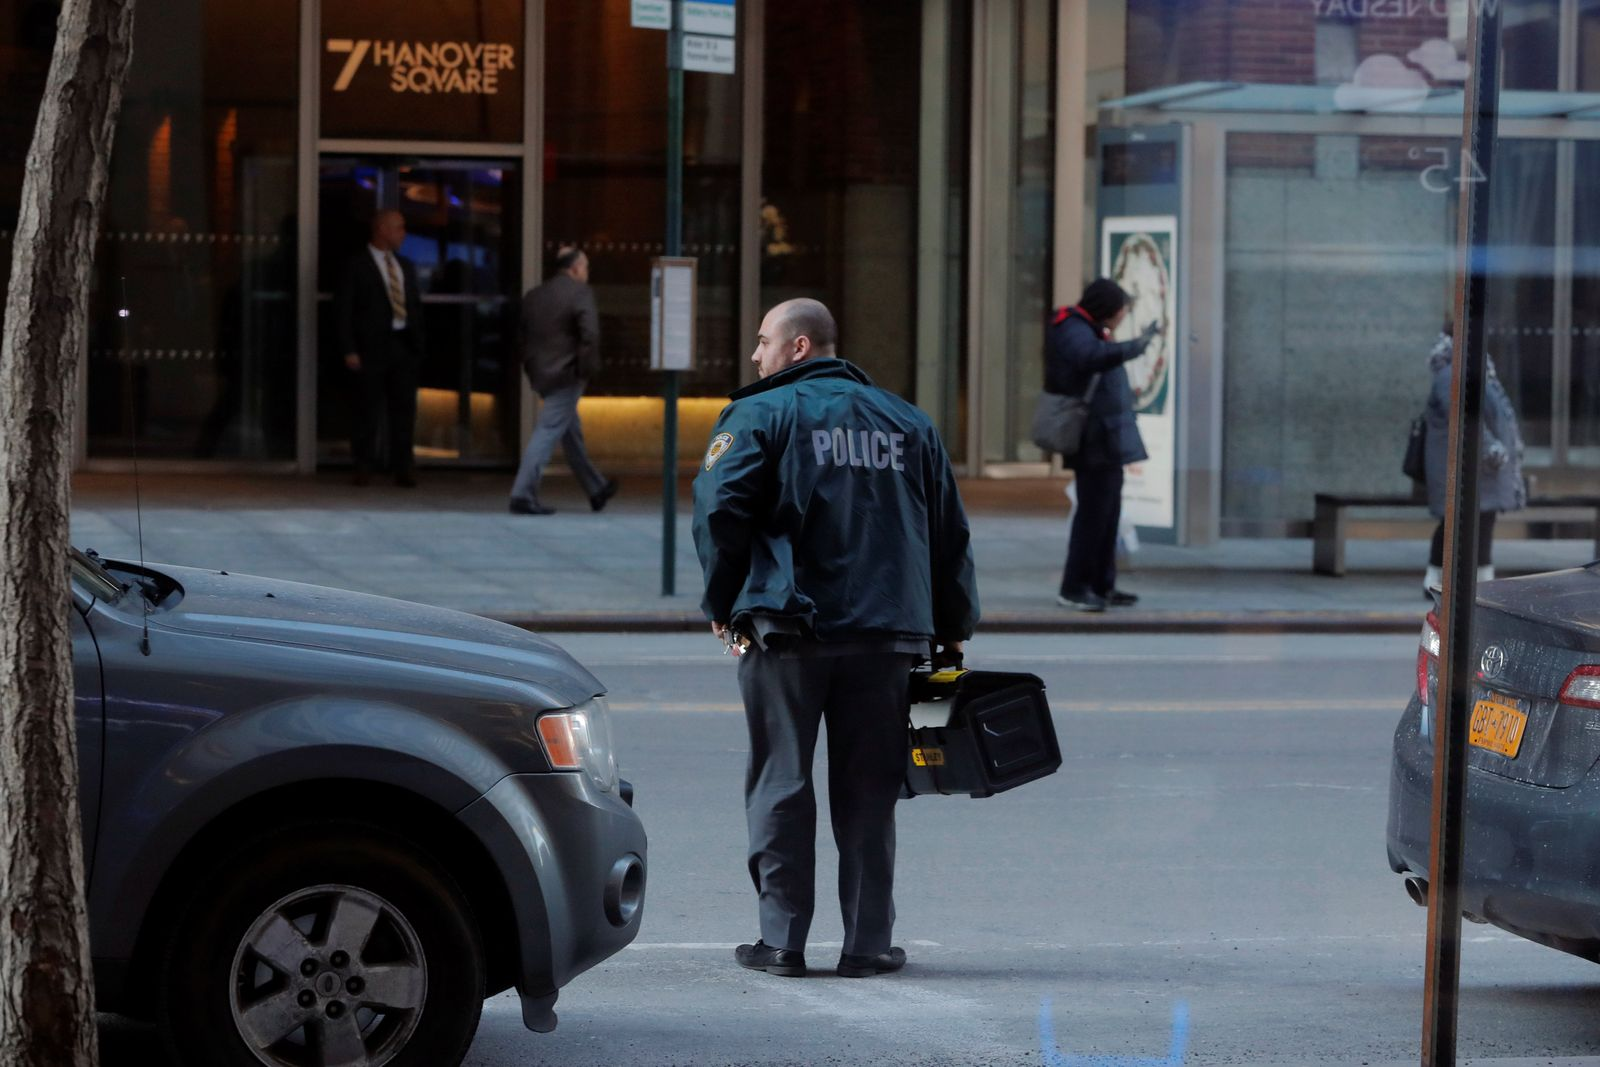 USA-NEWSWEEK/ police